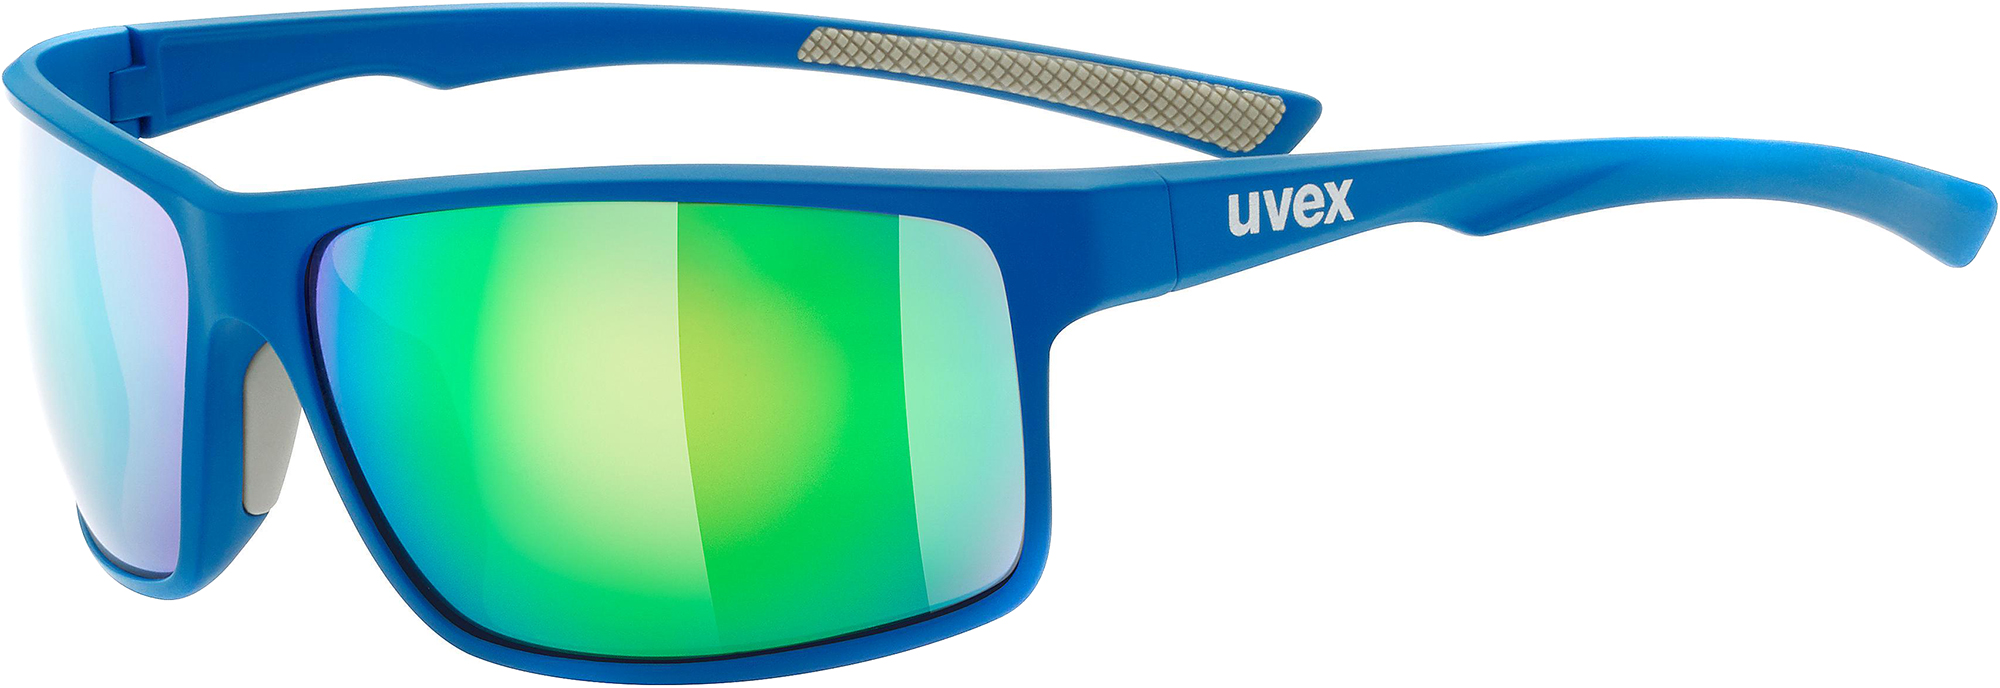 Uvex Солнцезащитные очки Lgl 44